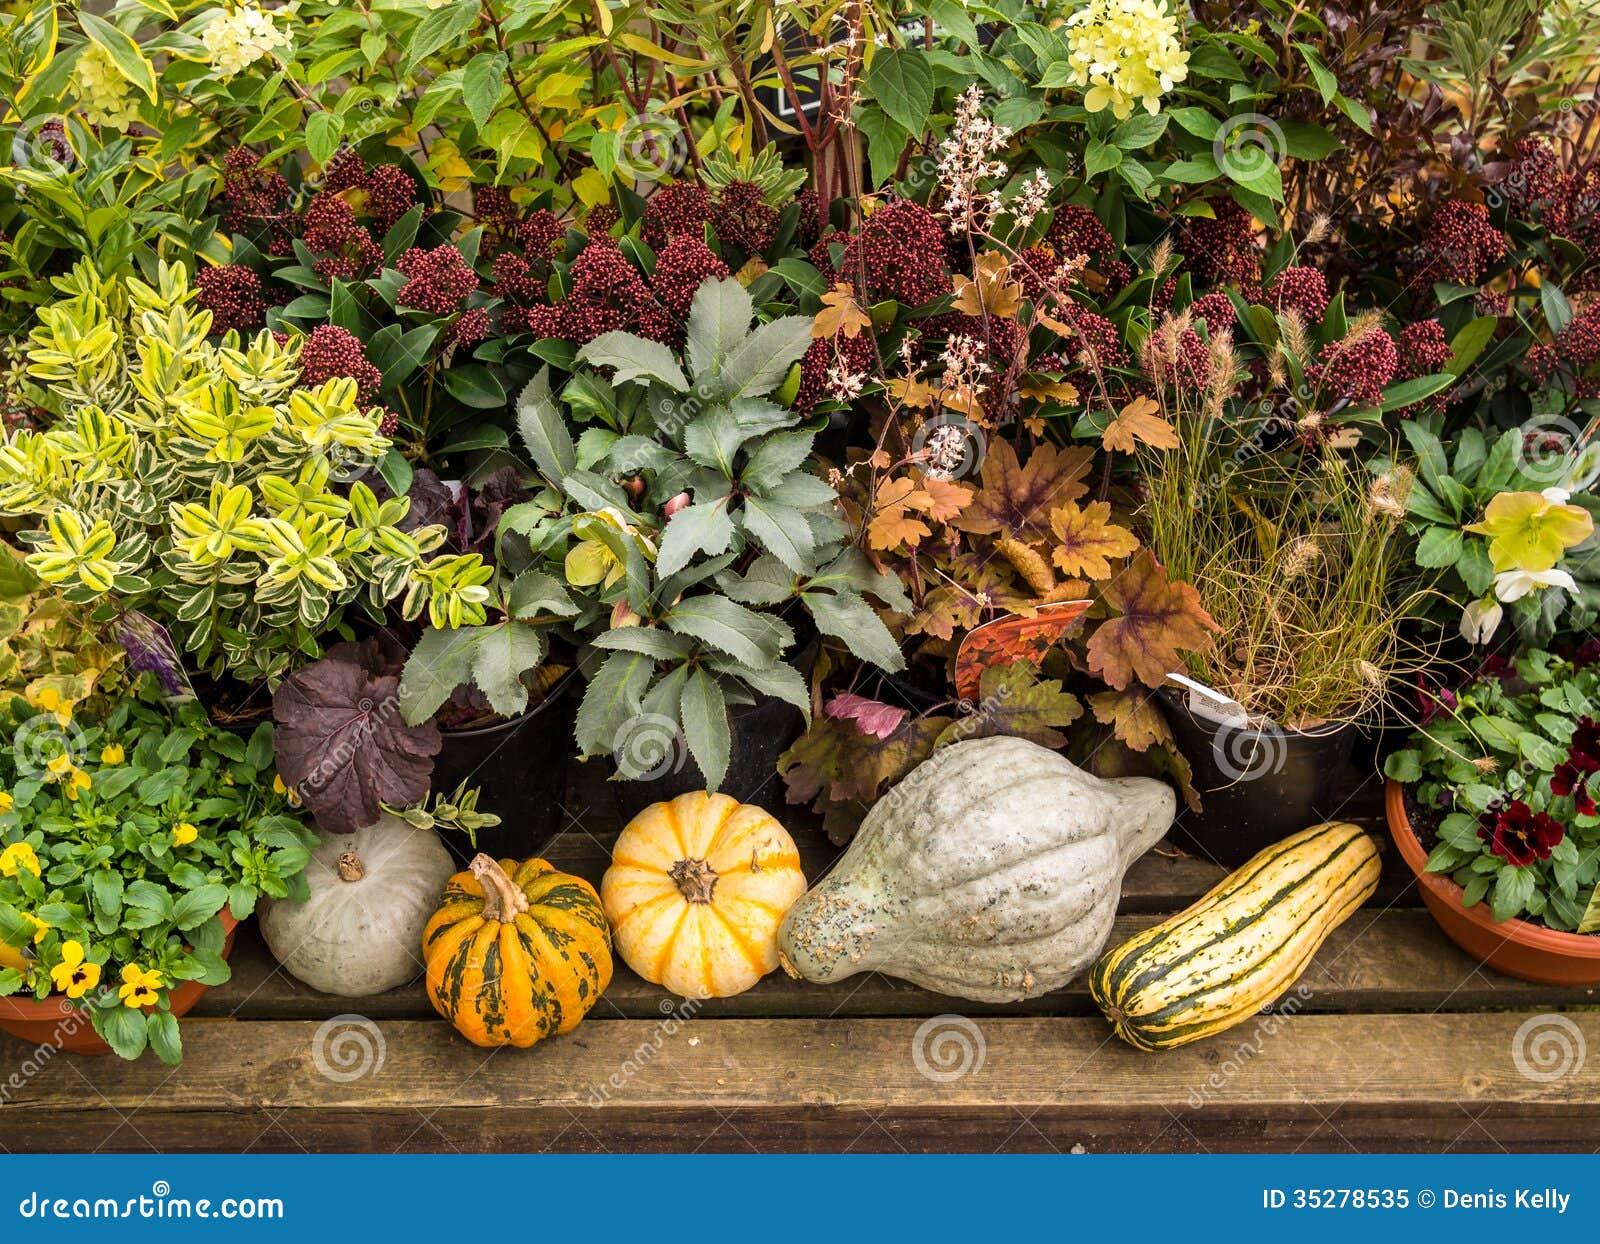 Autumn Vegetable Plants Garden Royalty Free Stock Photo Image 35278535